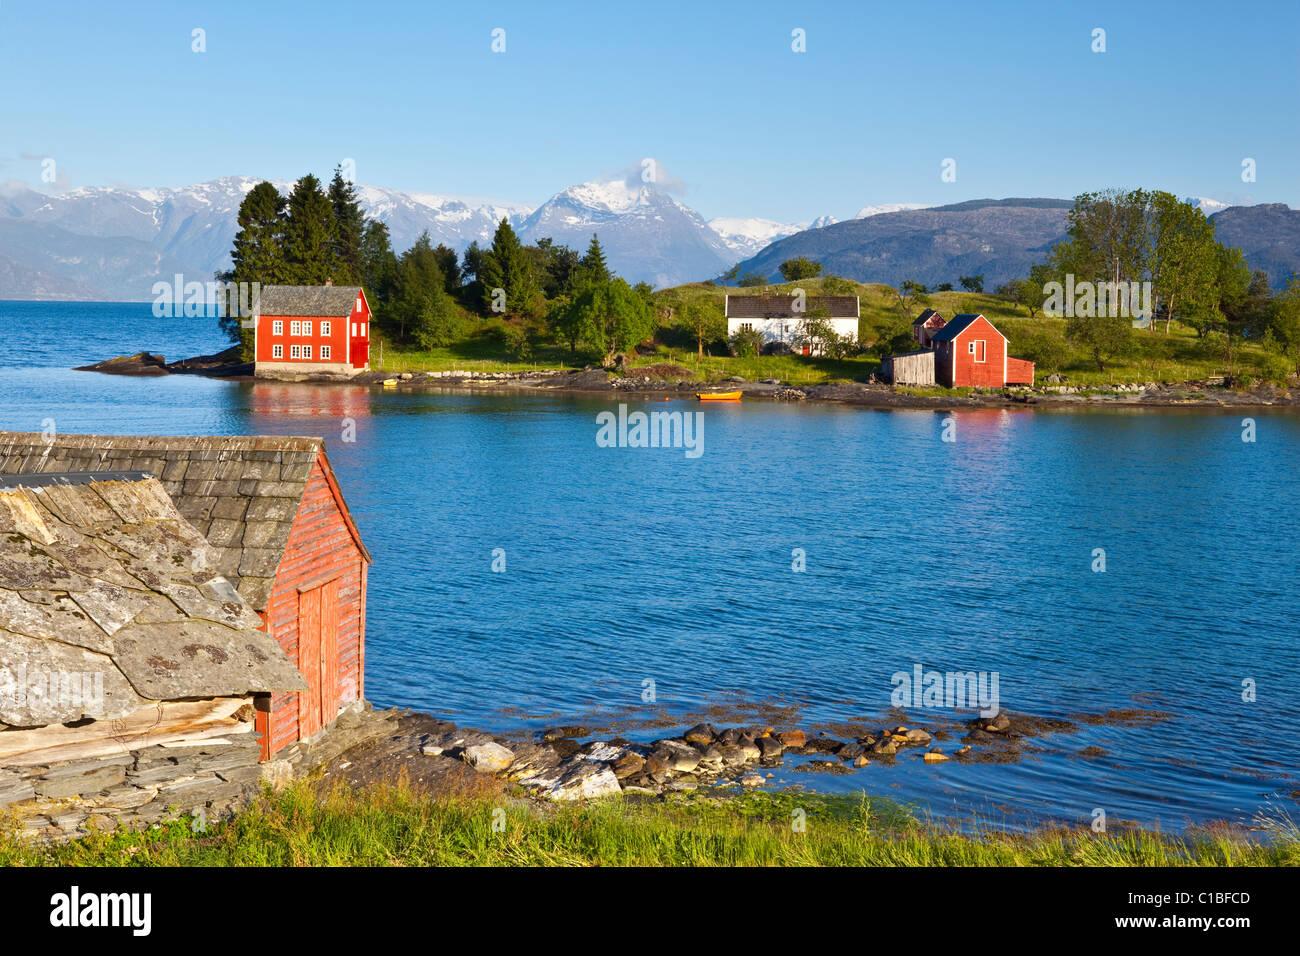 An idyllic rural island in the Hardanger Fjord, Hordaland, Norway - Stock Image